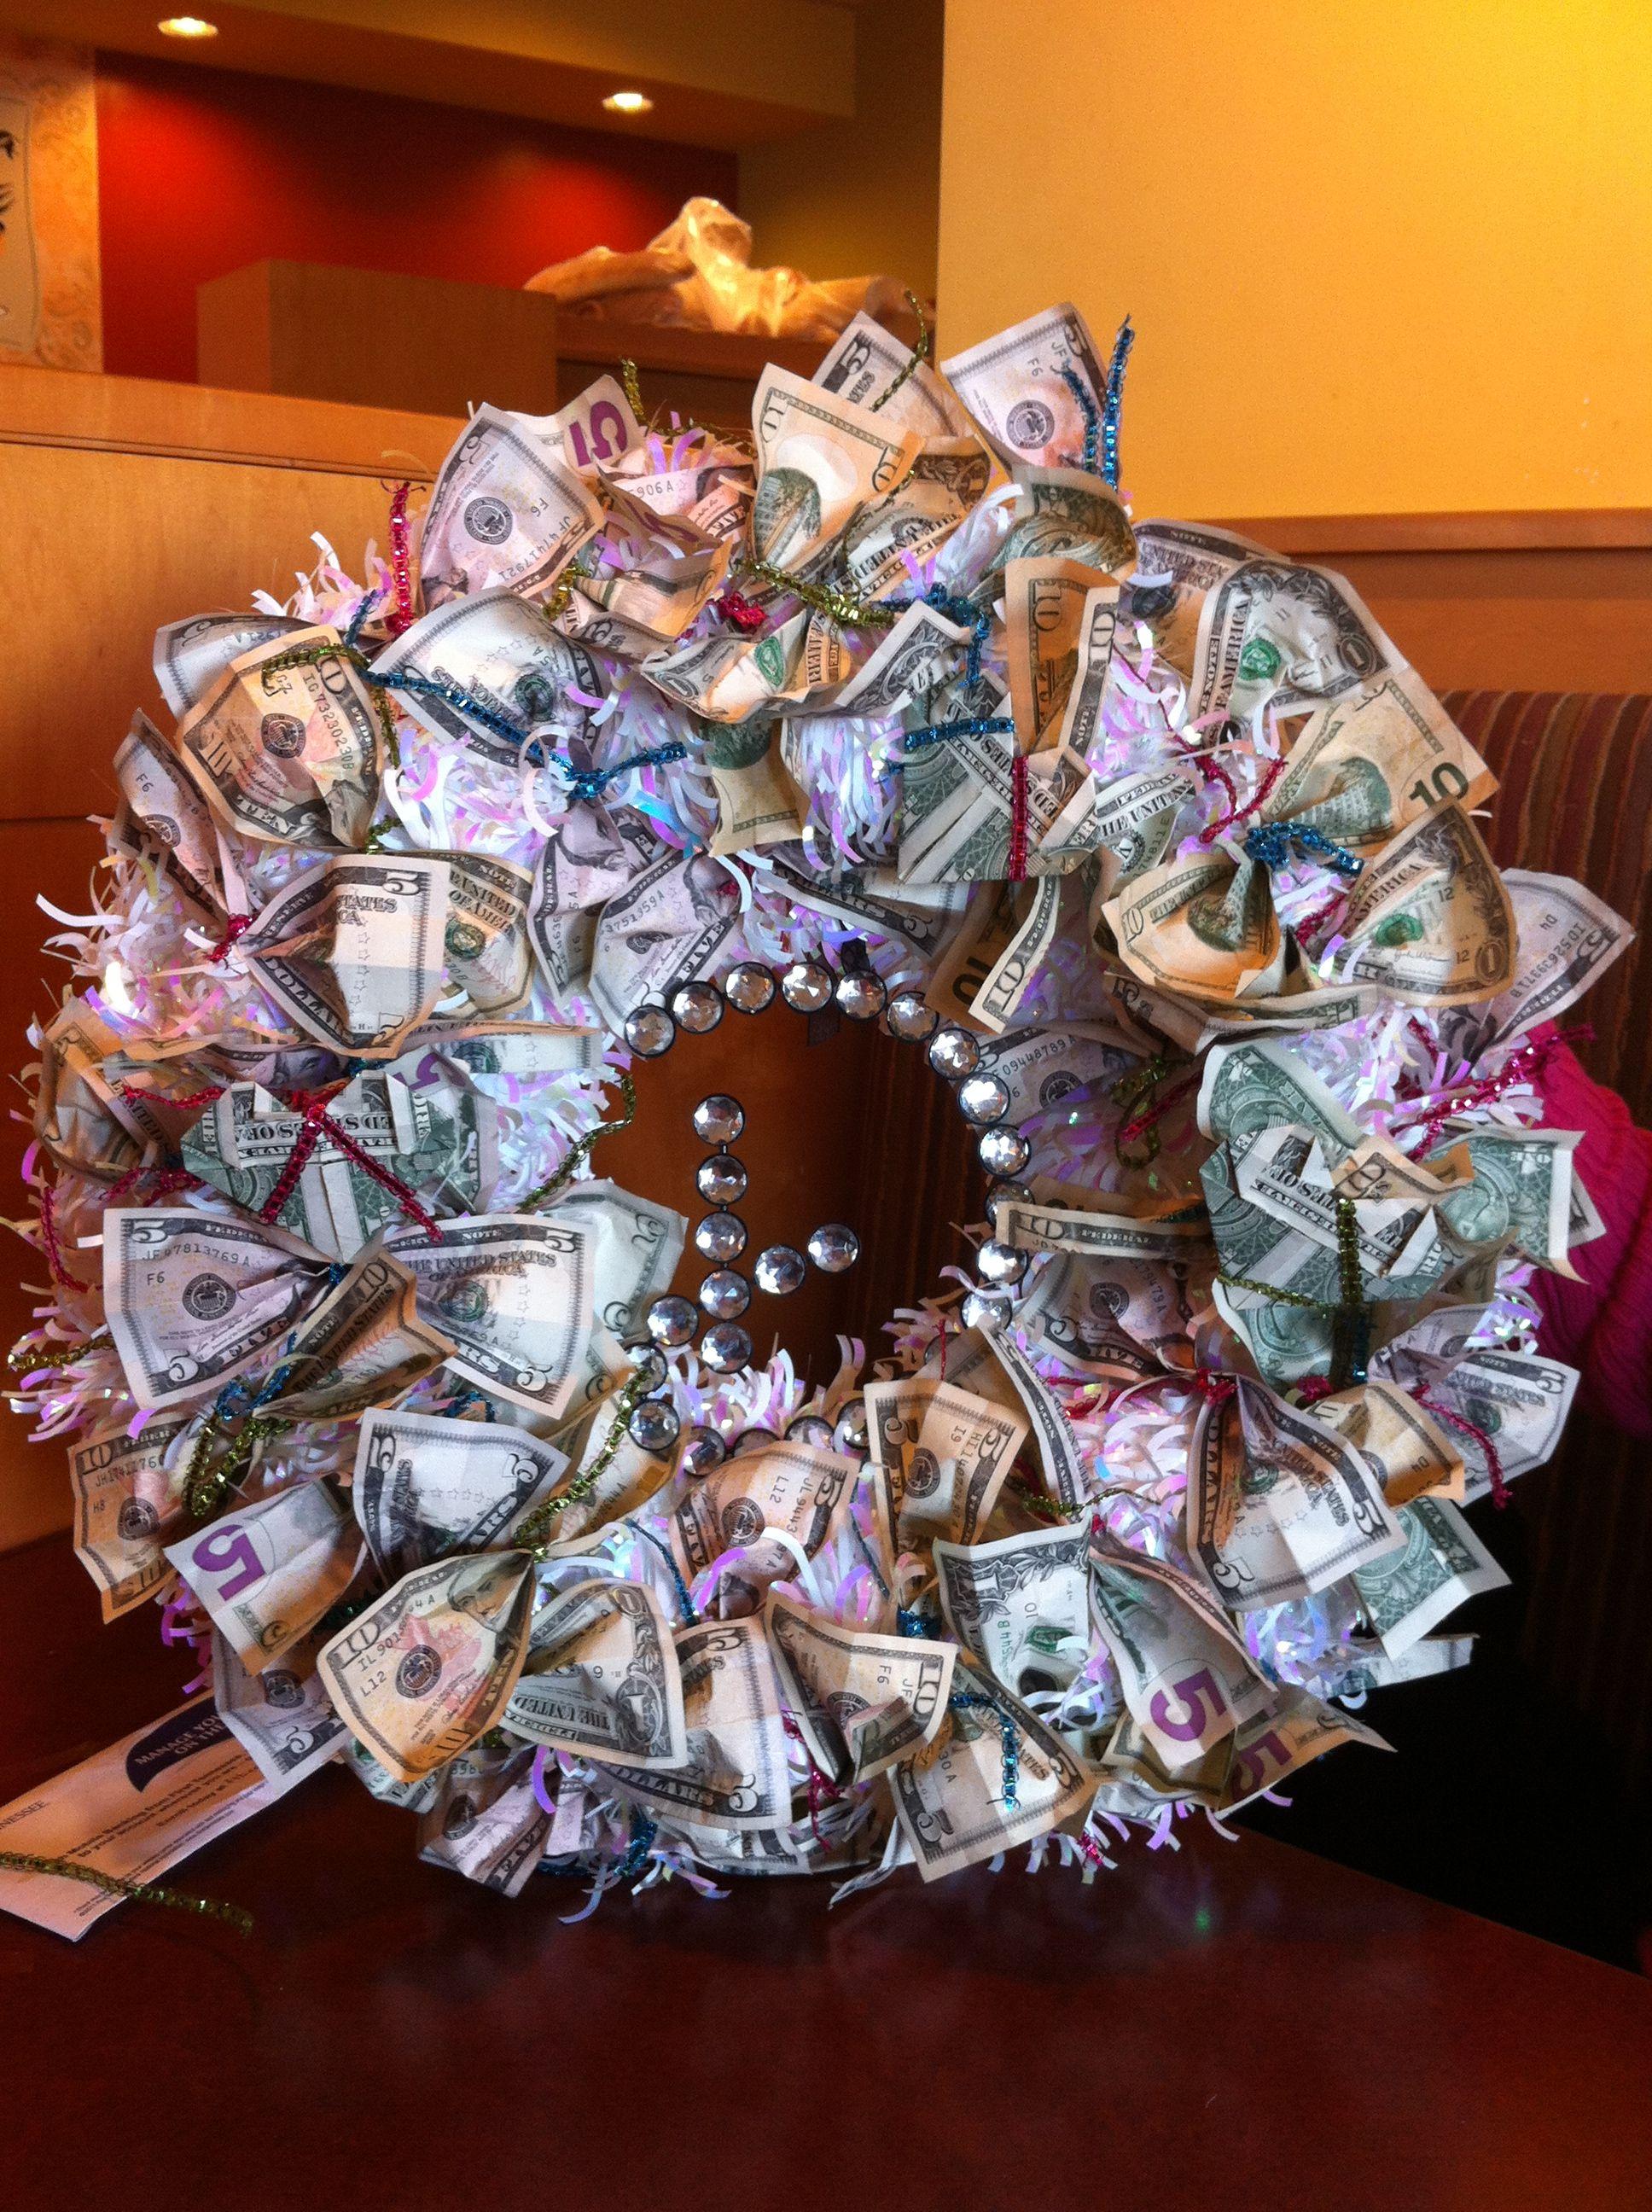 Money wreath for wedding gift | Gifts | Pinterest ... - photo#48